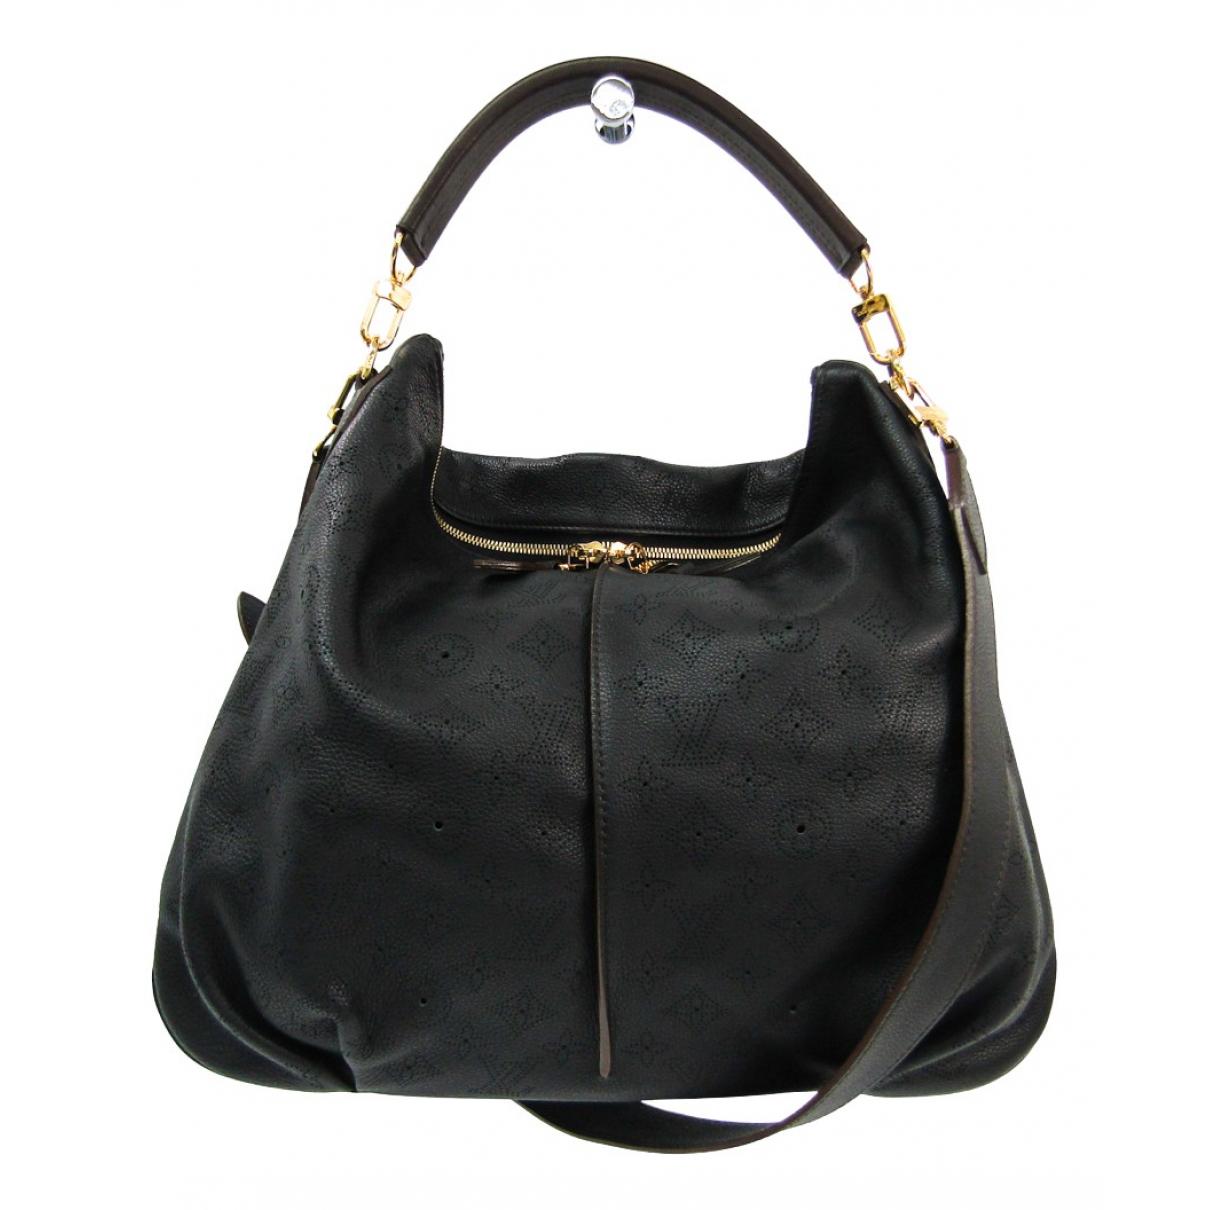 Louis Vuitton Mahina Black Leather handbag for Women \N